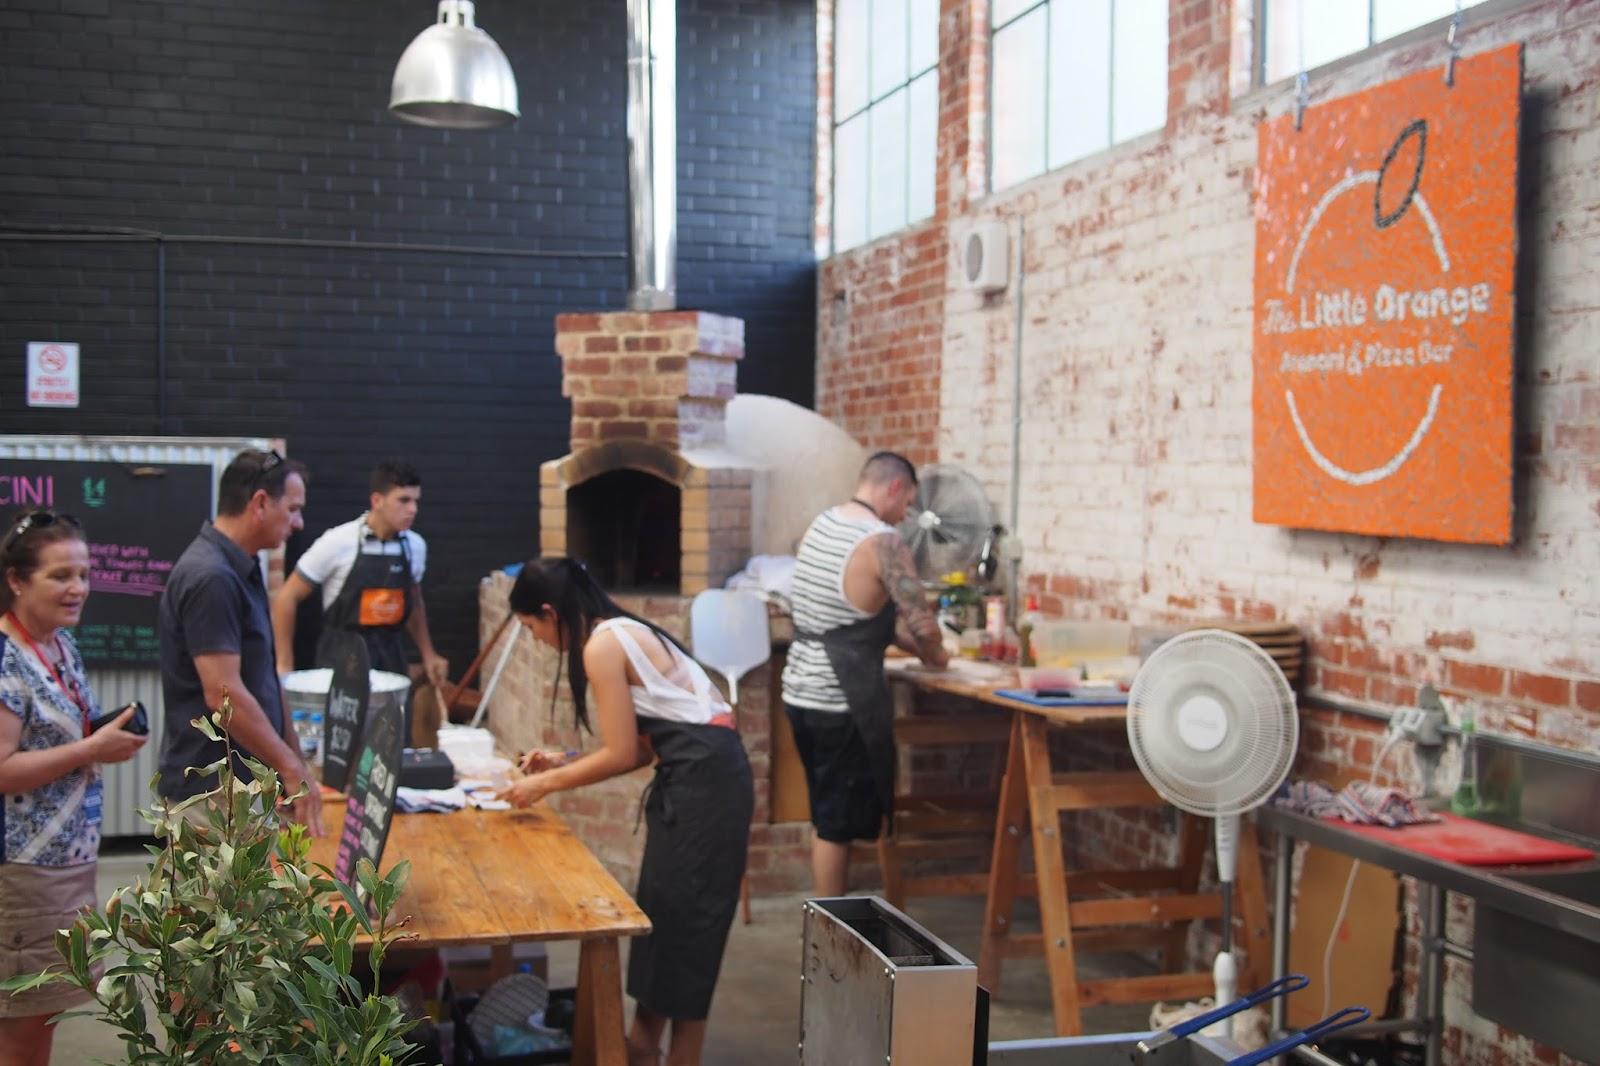 Little Orange Arancini - The Chopping Board